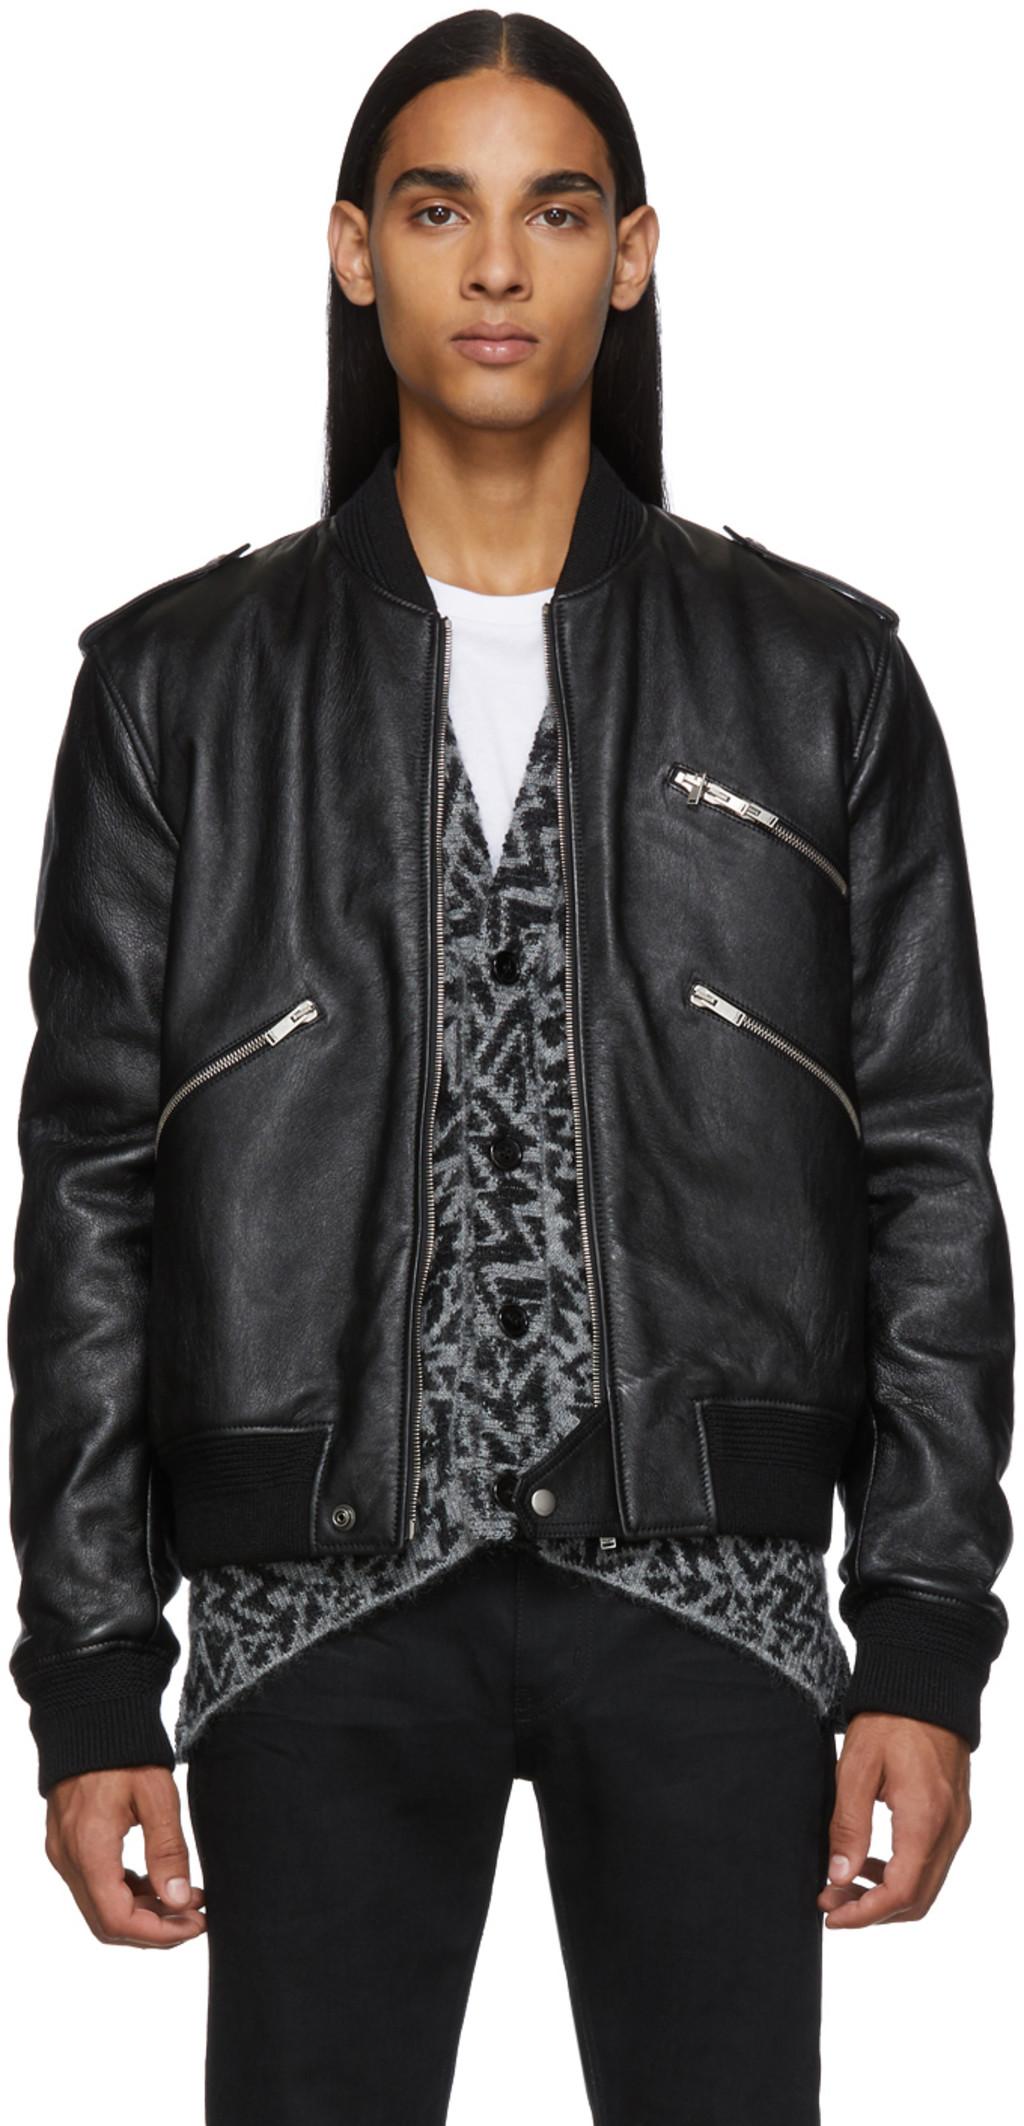 a99666a0c Black Leather Bomber Jacket